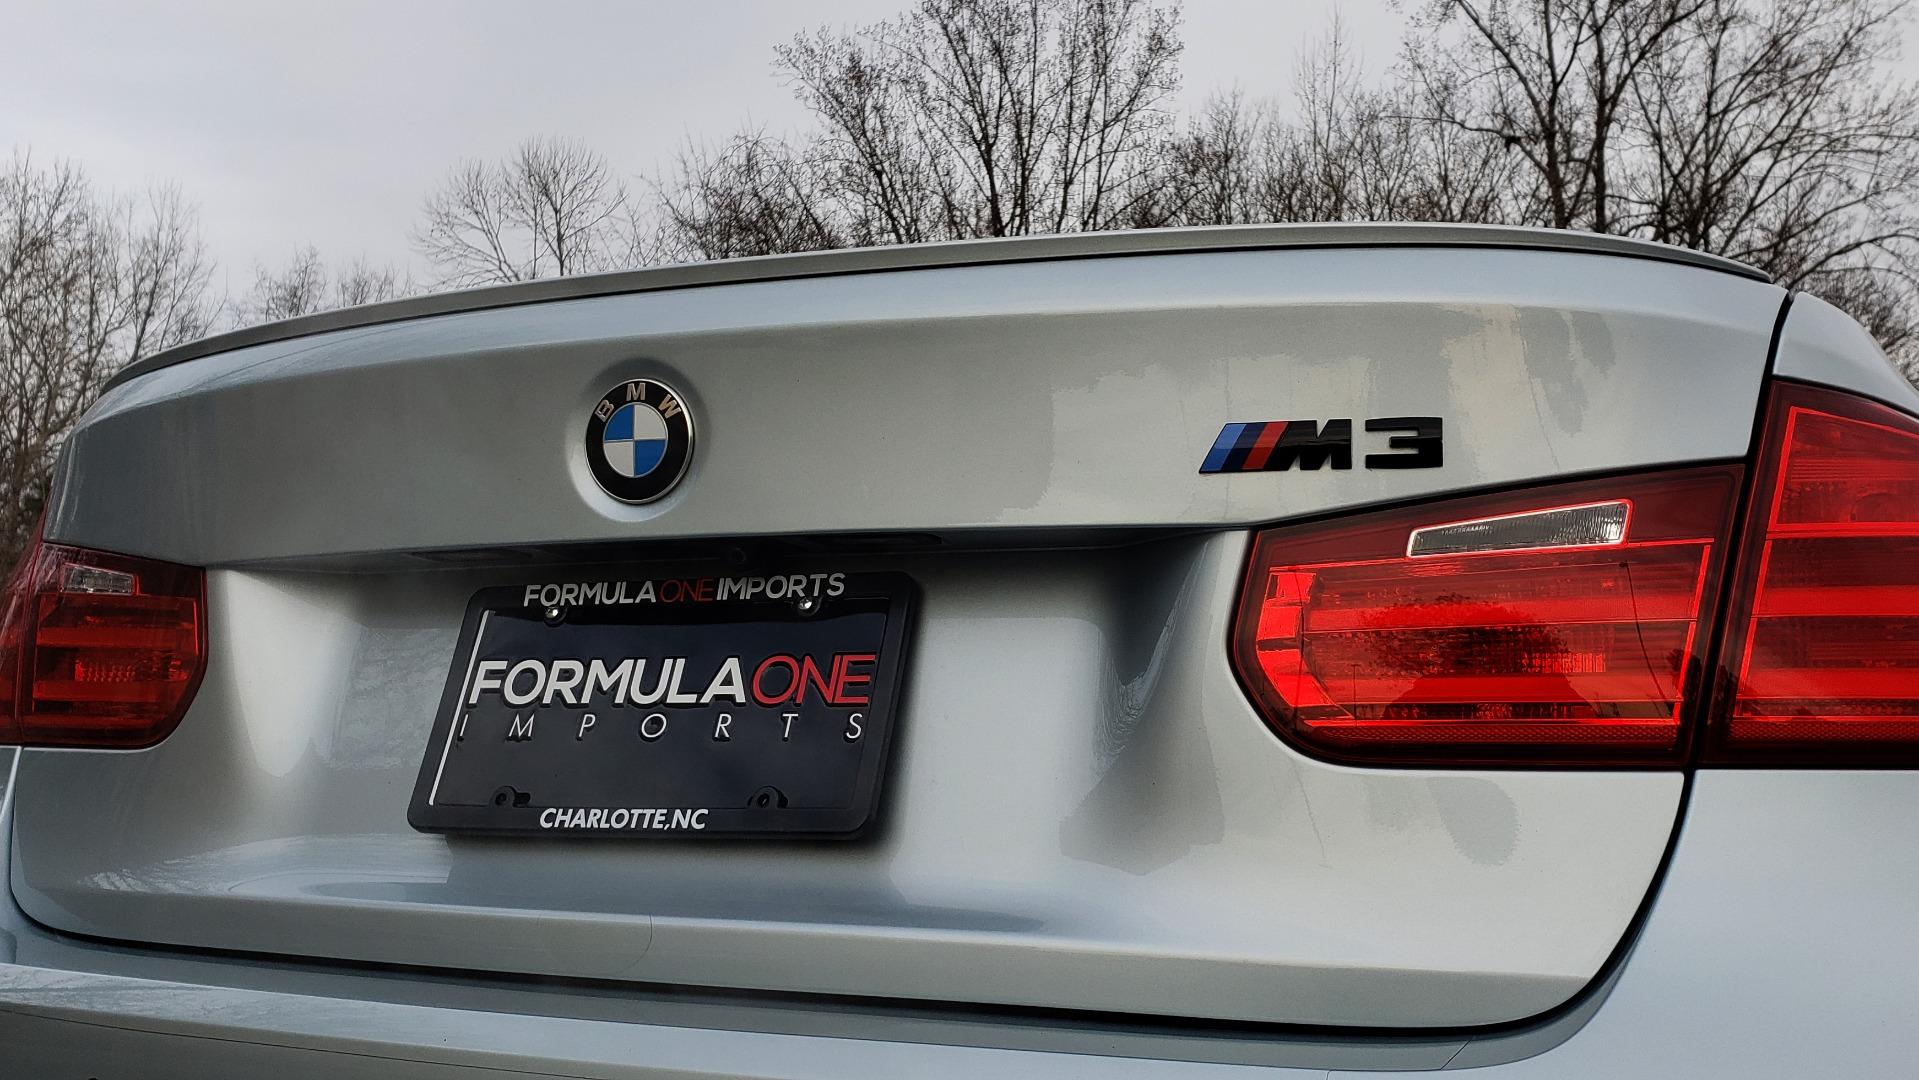 Used 2015 BMW M3 EXECUTIVE PKG / NAV / CAMERA / HUD / CARBON FIBER ROOF for sale Sold at Formula Imports in Charlotte NC 28227 35